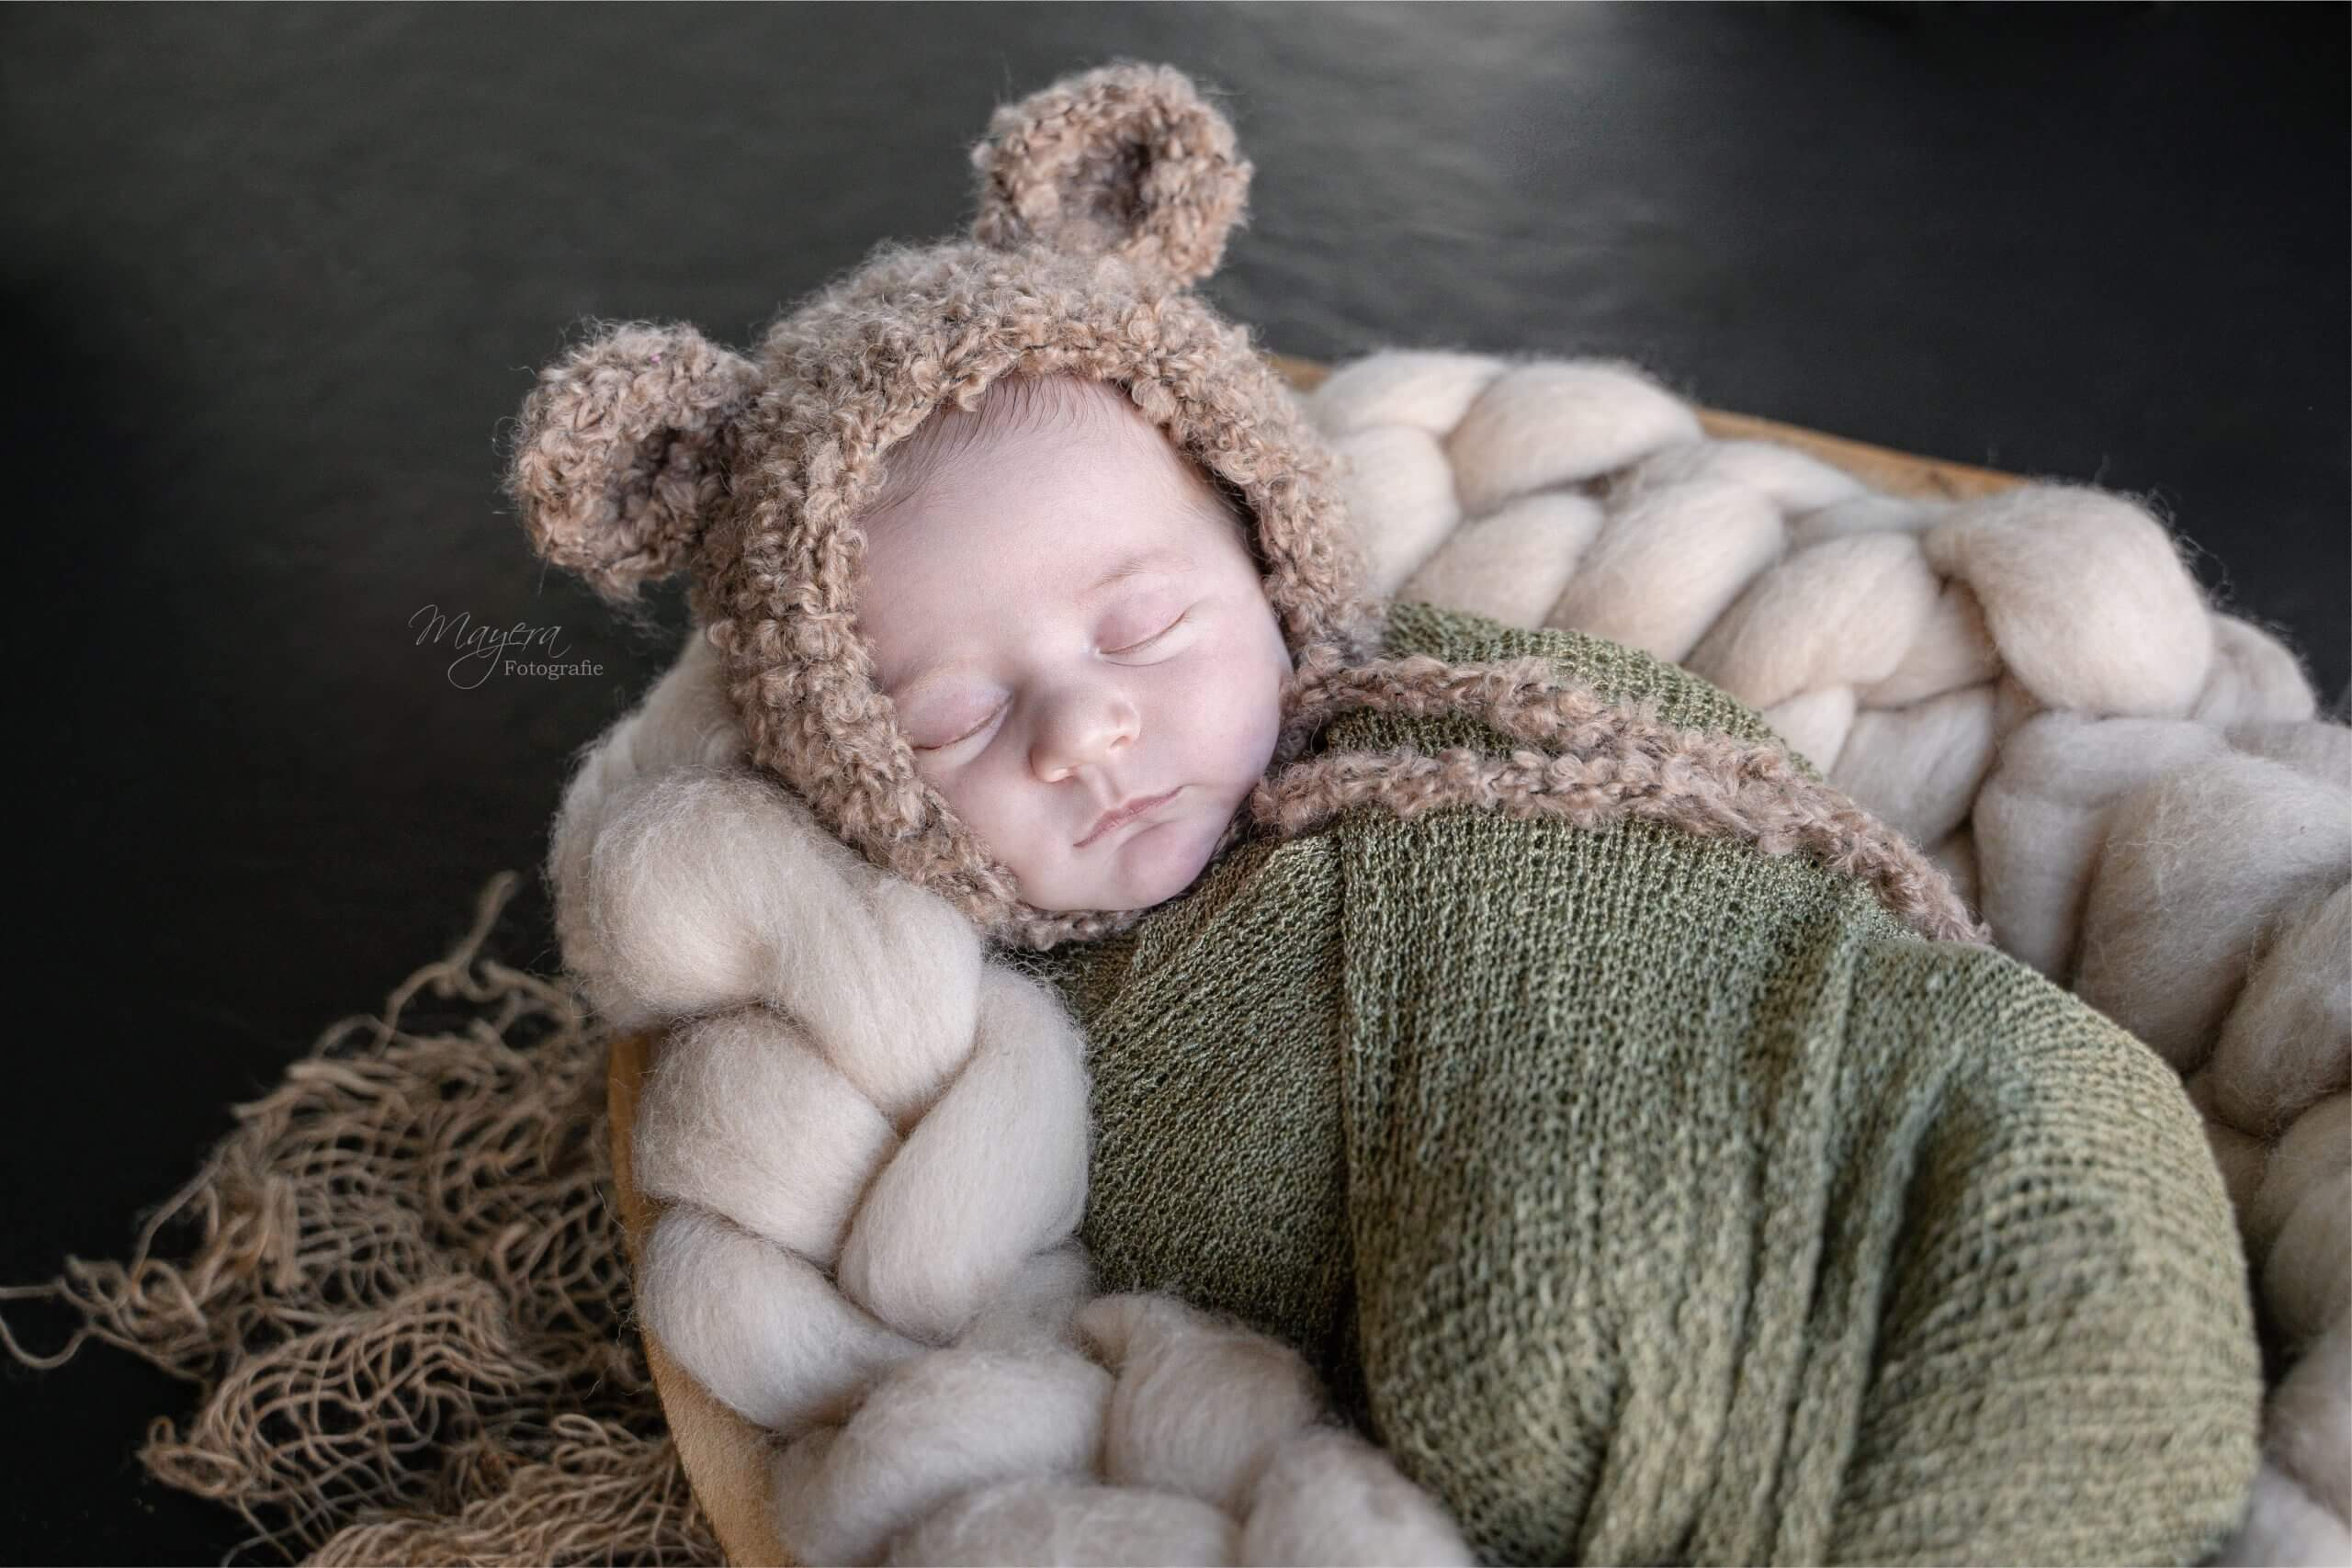 Newborn baby girl fotografe Zeist pure puur